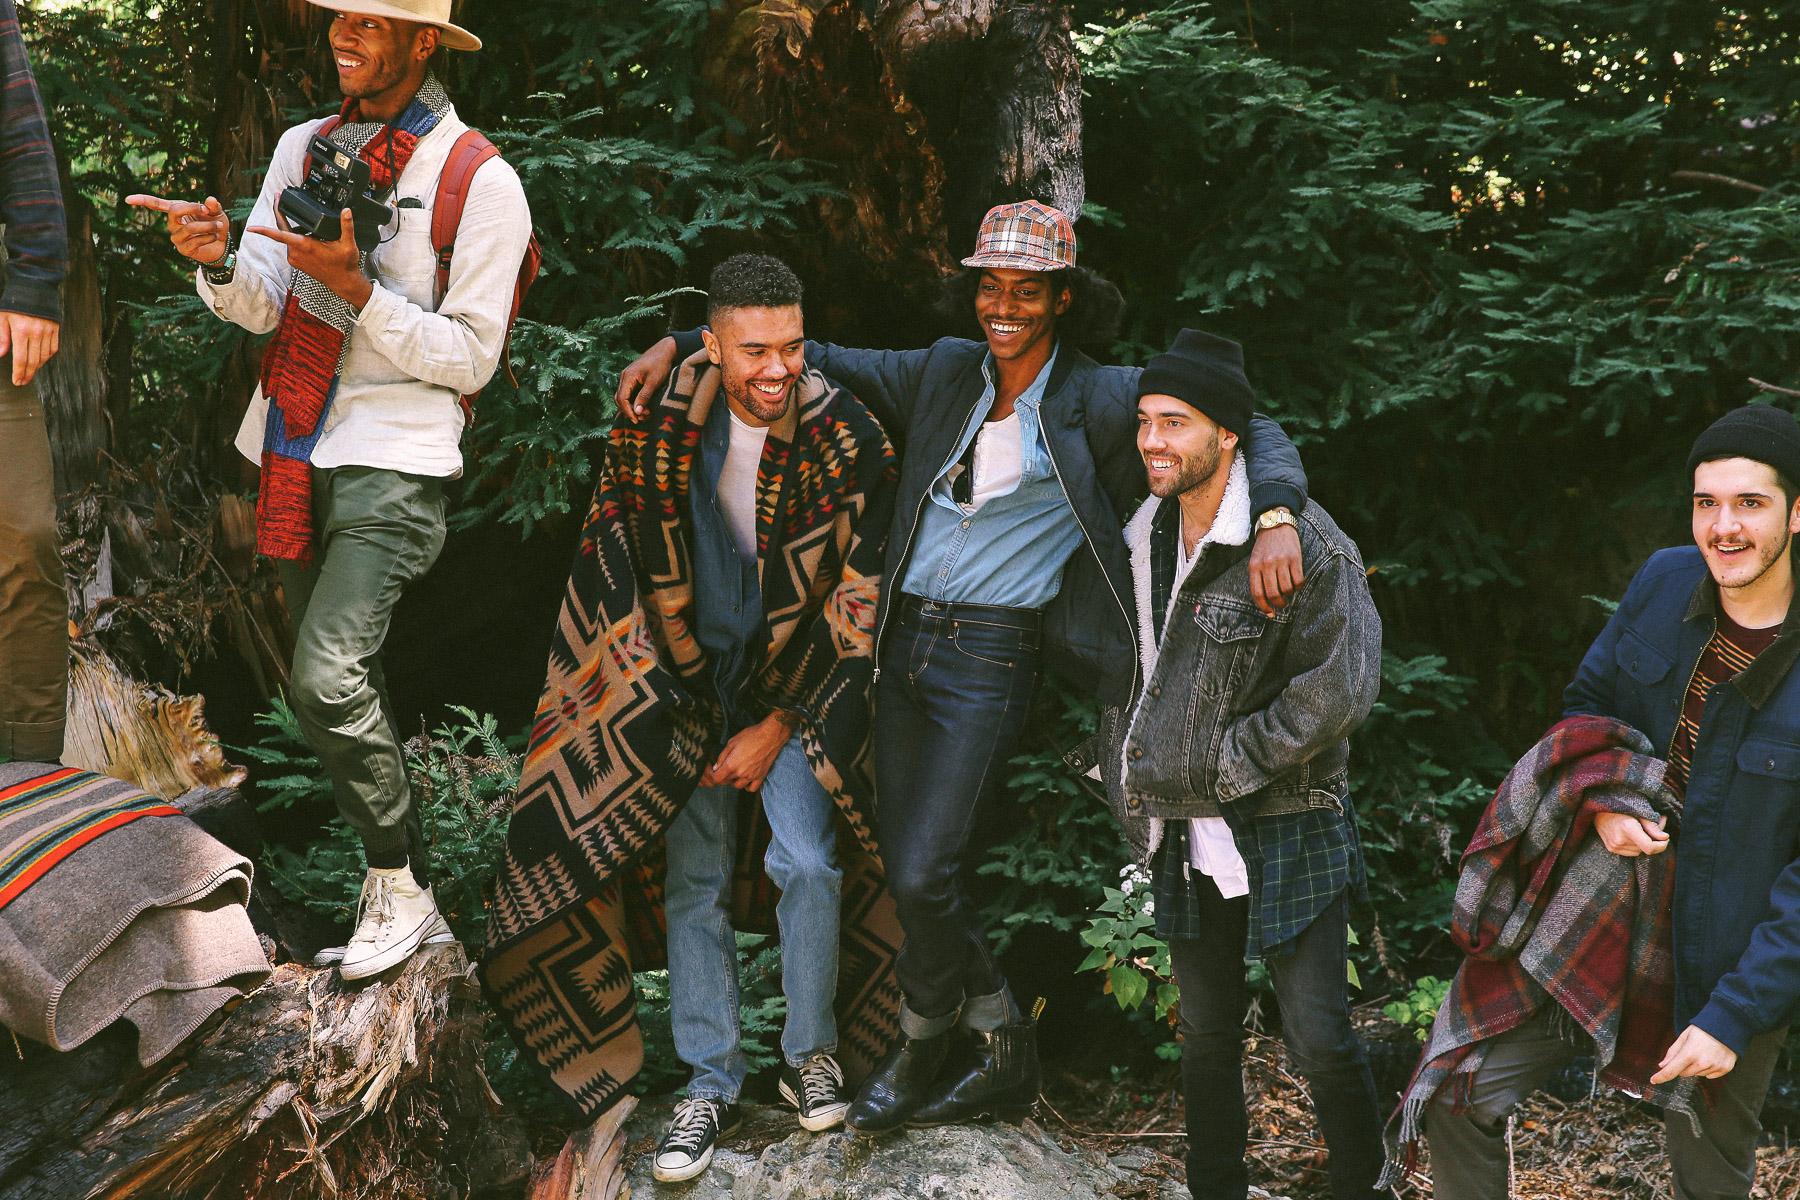 galindo-urban-outfitters-2-03.jpg